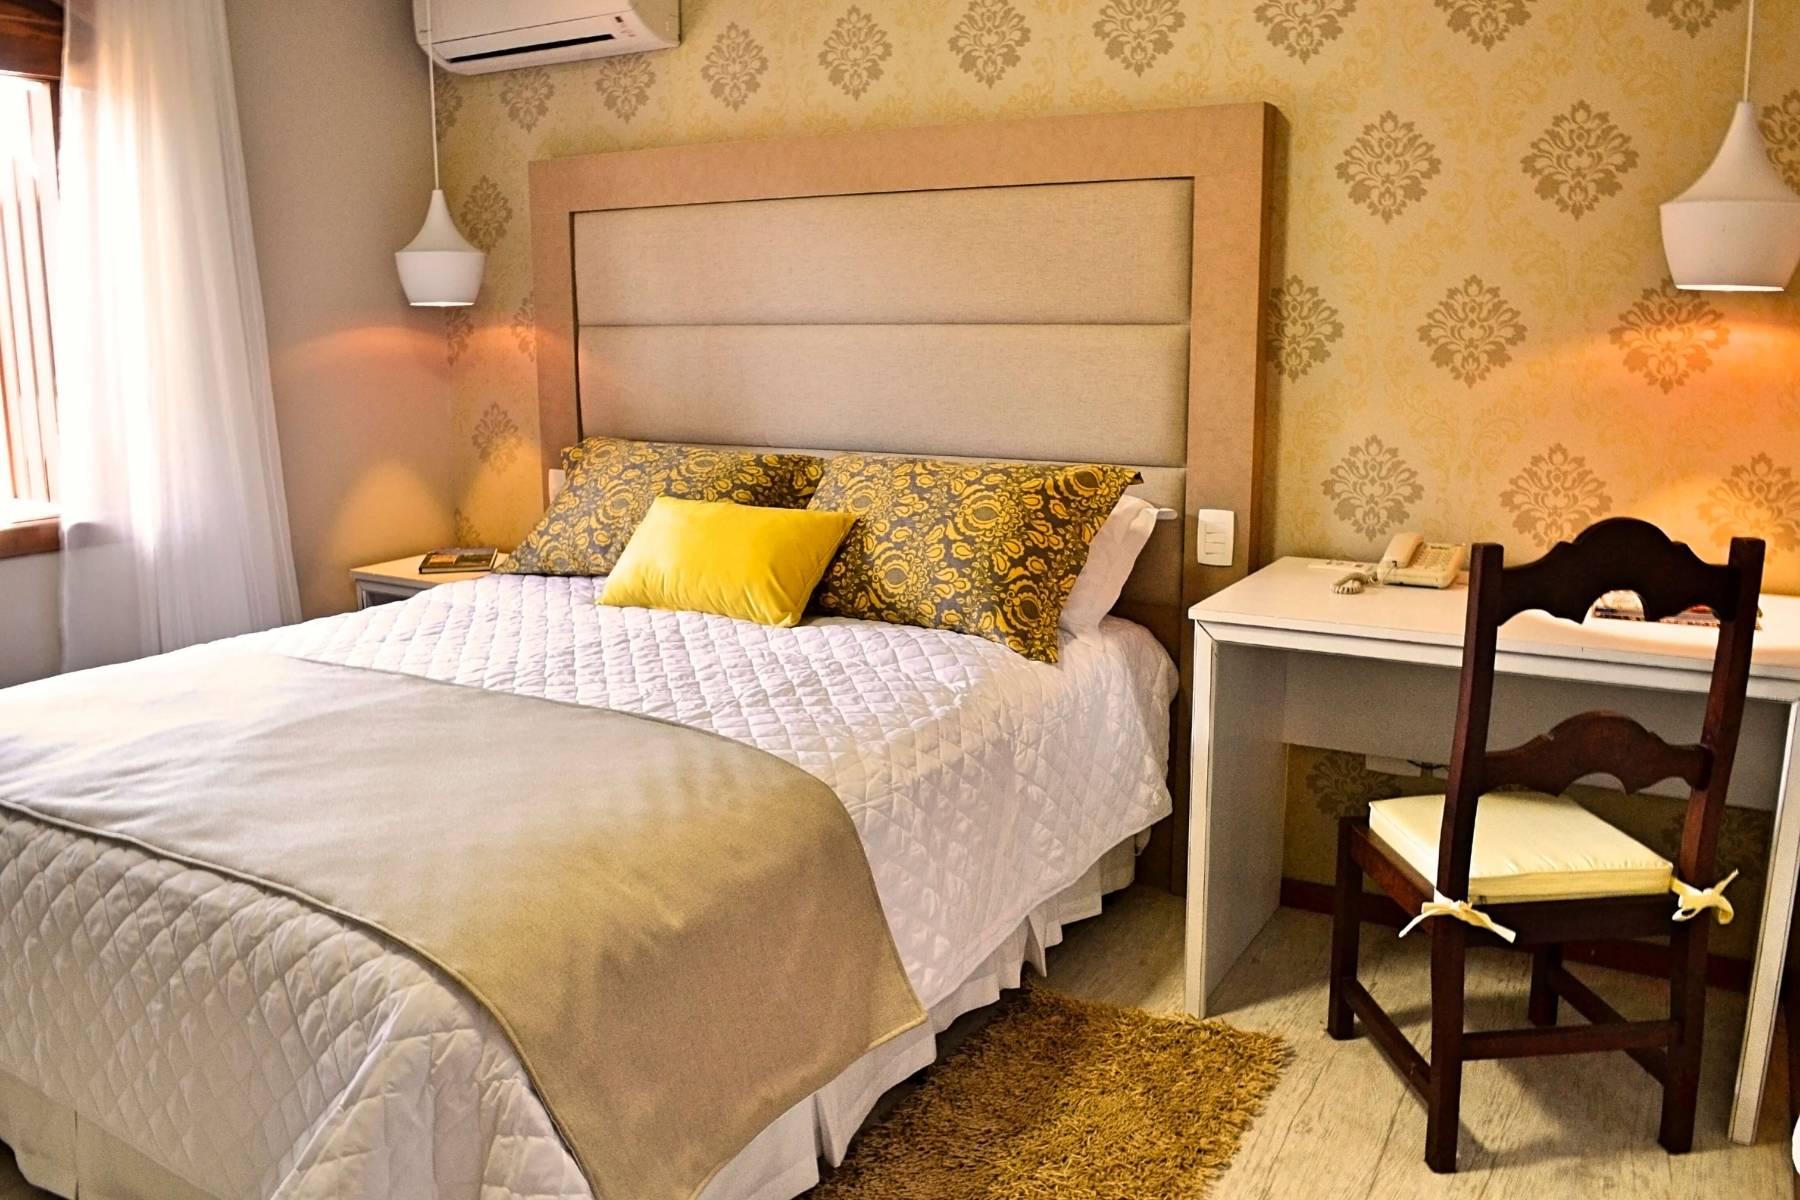 Bangalô Ipê - Hotel Bangalôs da Serra #CurtaSuaFamilia #HotelSustentavel #TurismoVerde #TravelersChoice #EcoLider #Gramado